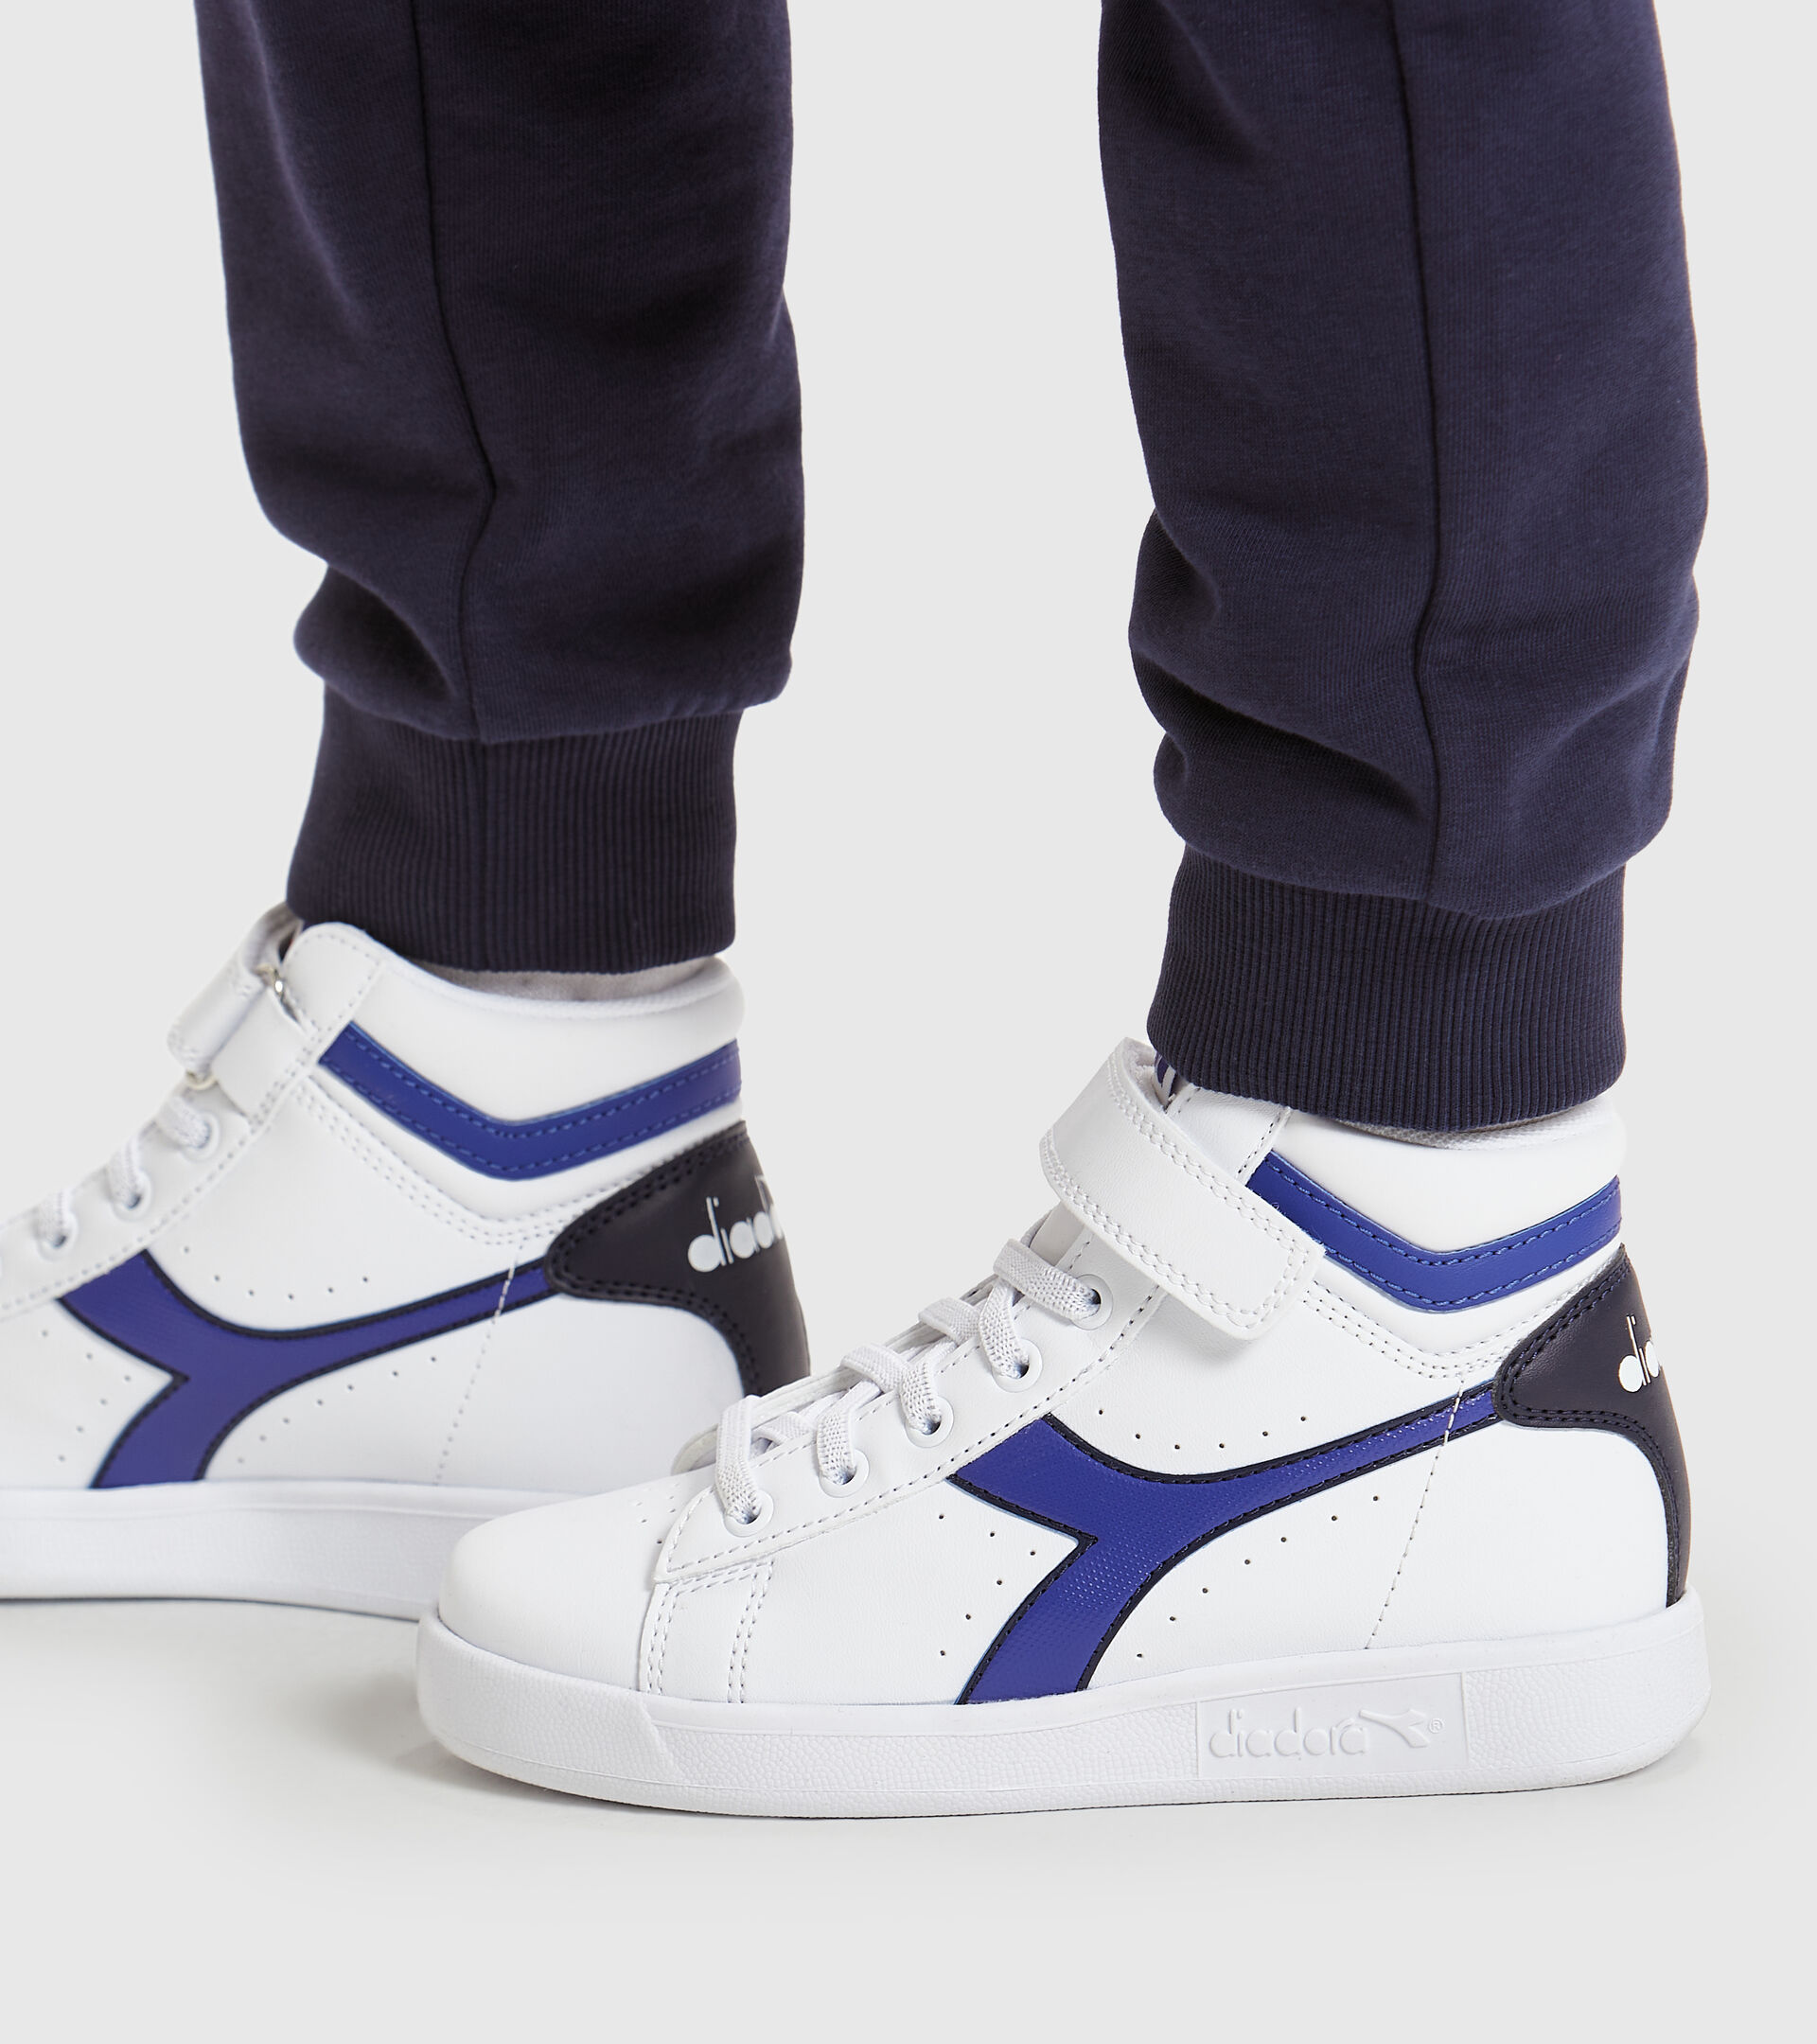 Chaussures de sport - Enfants 4-8 ans GAME P HIGH PS BLANC/BLEU CABAN - Diadora